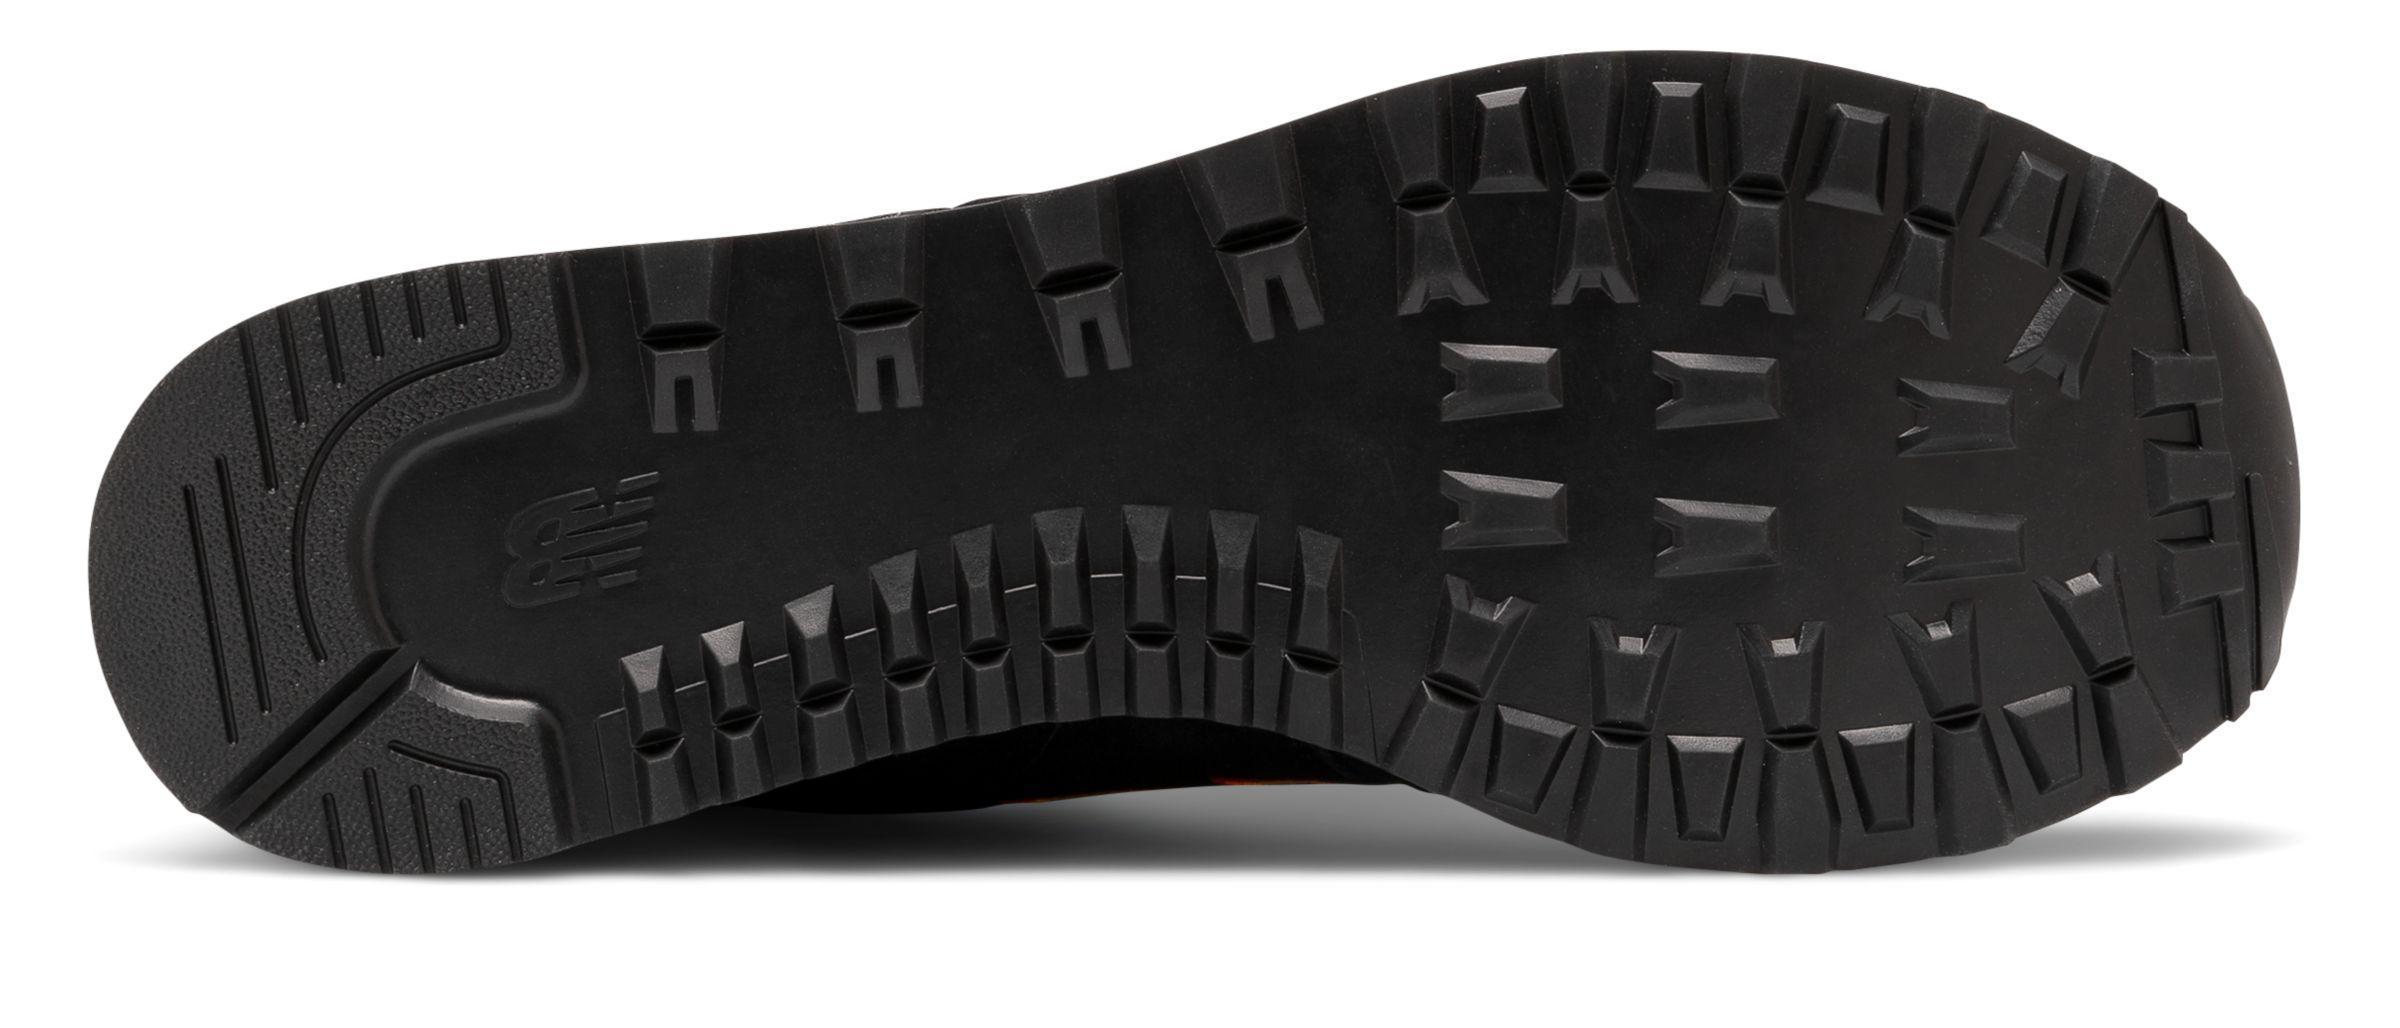 New Balance Leather Unisex 574 Pride